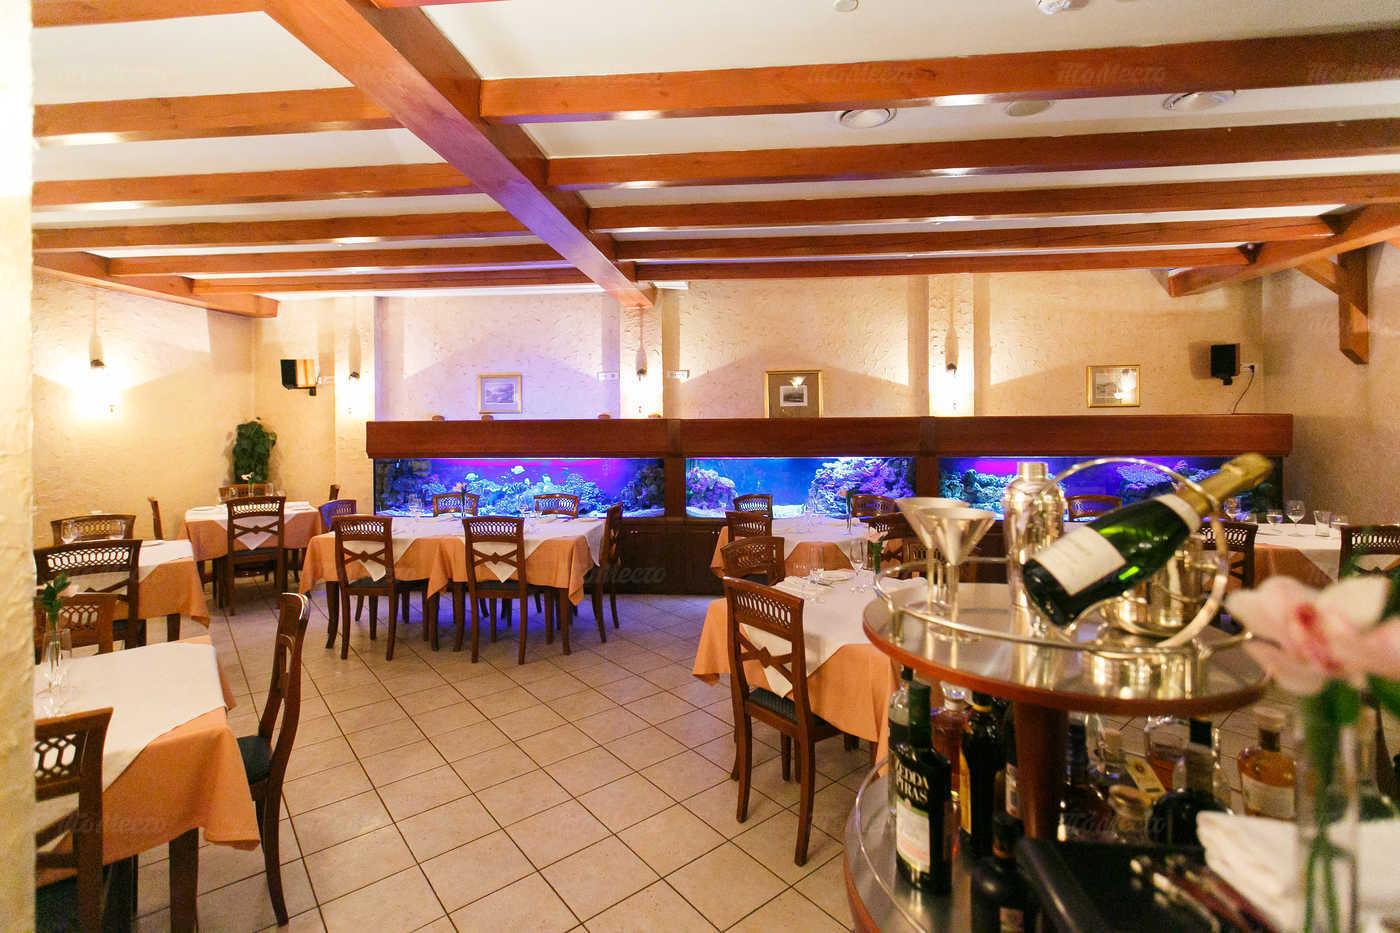 Меню ресторана Dolce Vita Ristorante на улице Розы Люксембург